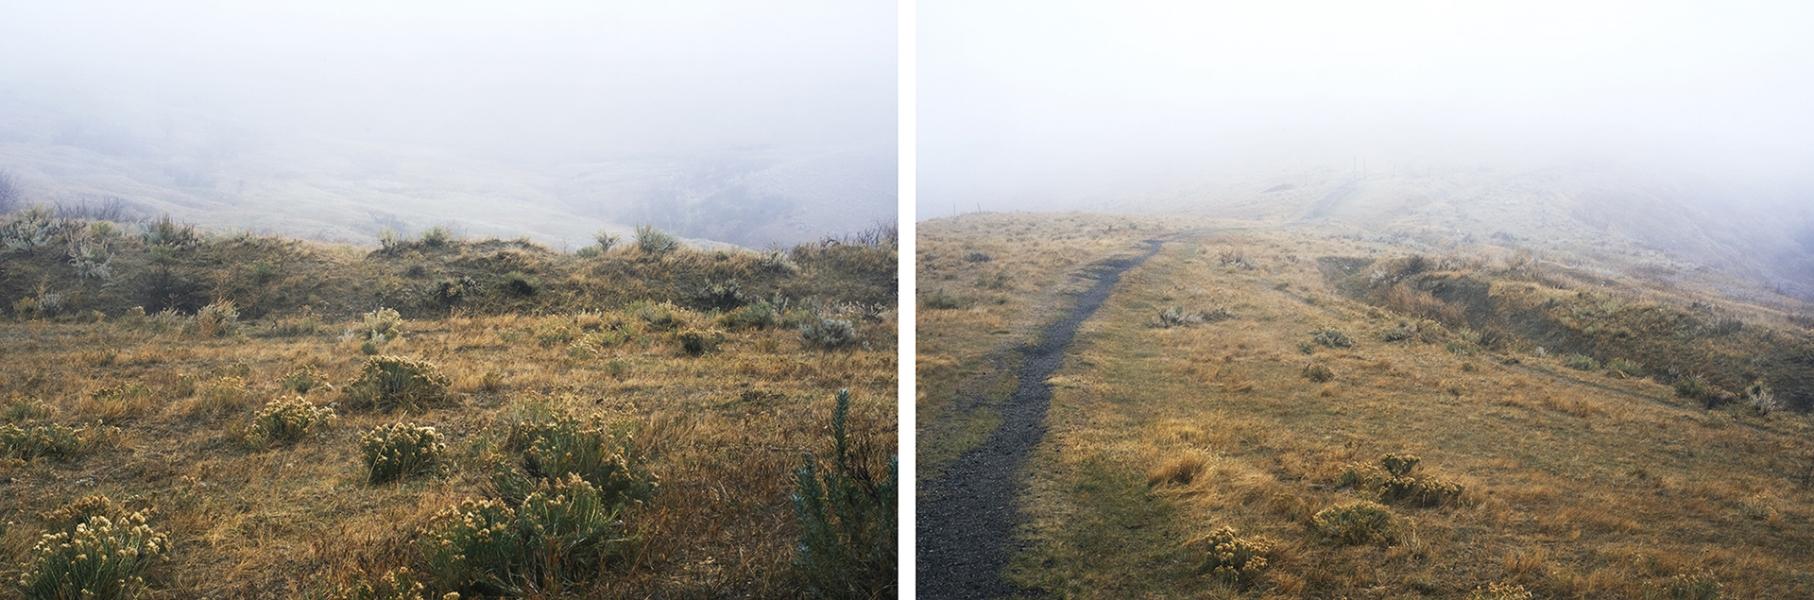 Deborah Farnault  Trail Fog (Fetterman Battlefield), 2016